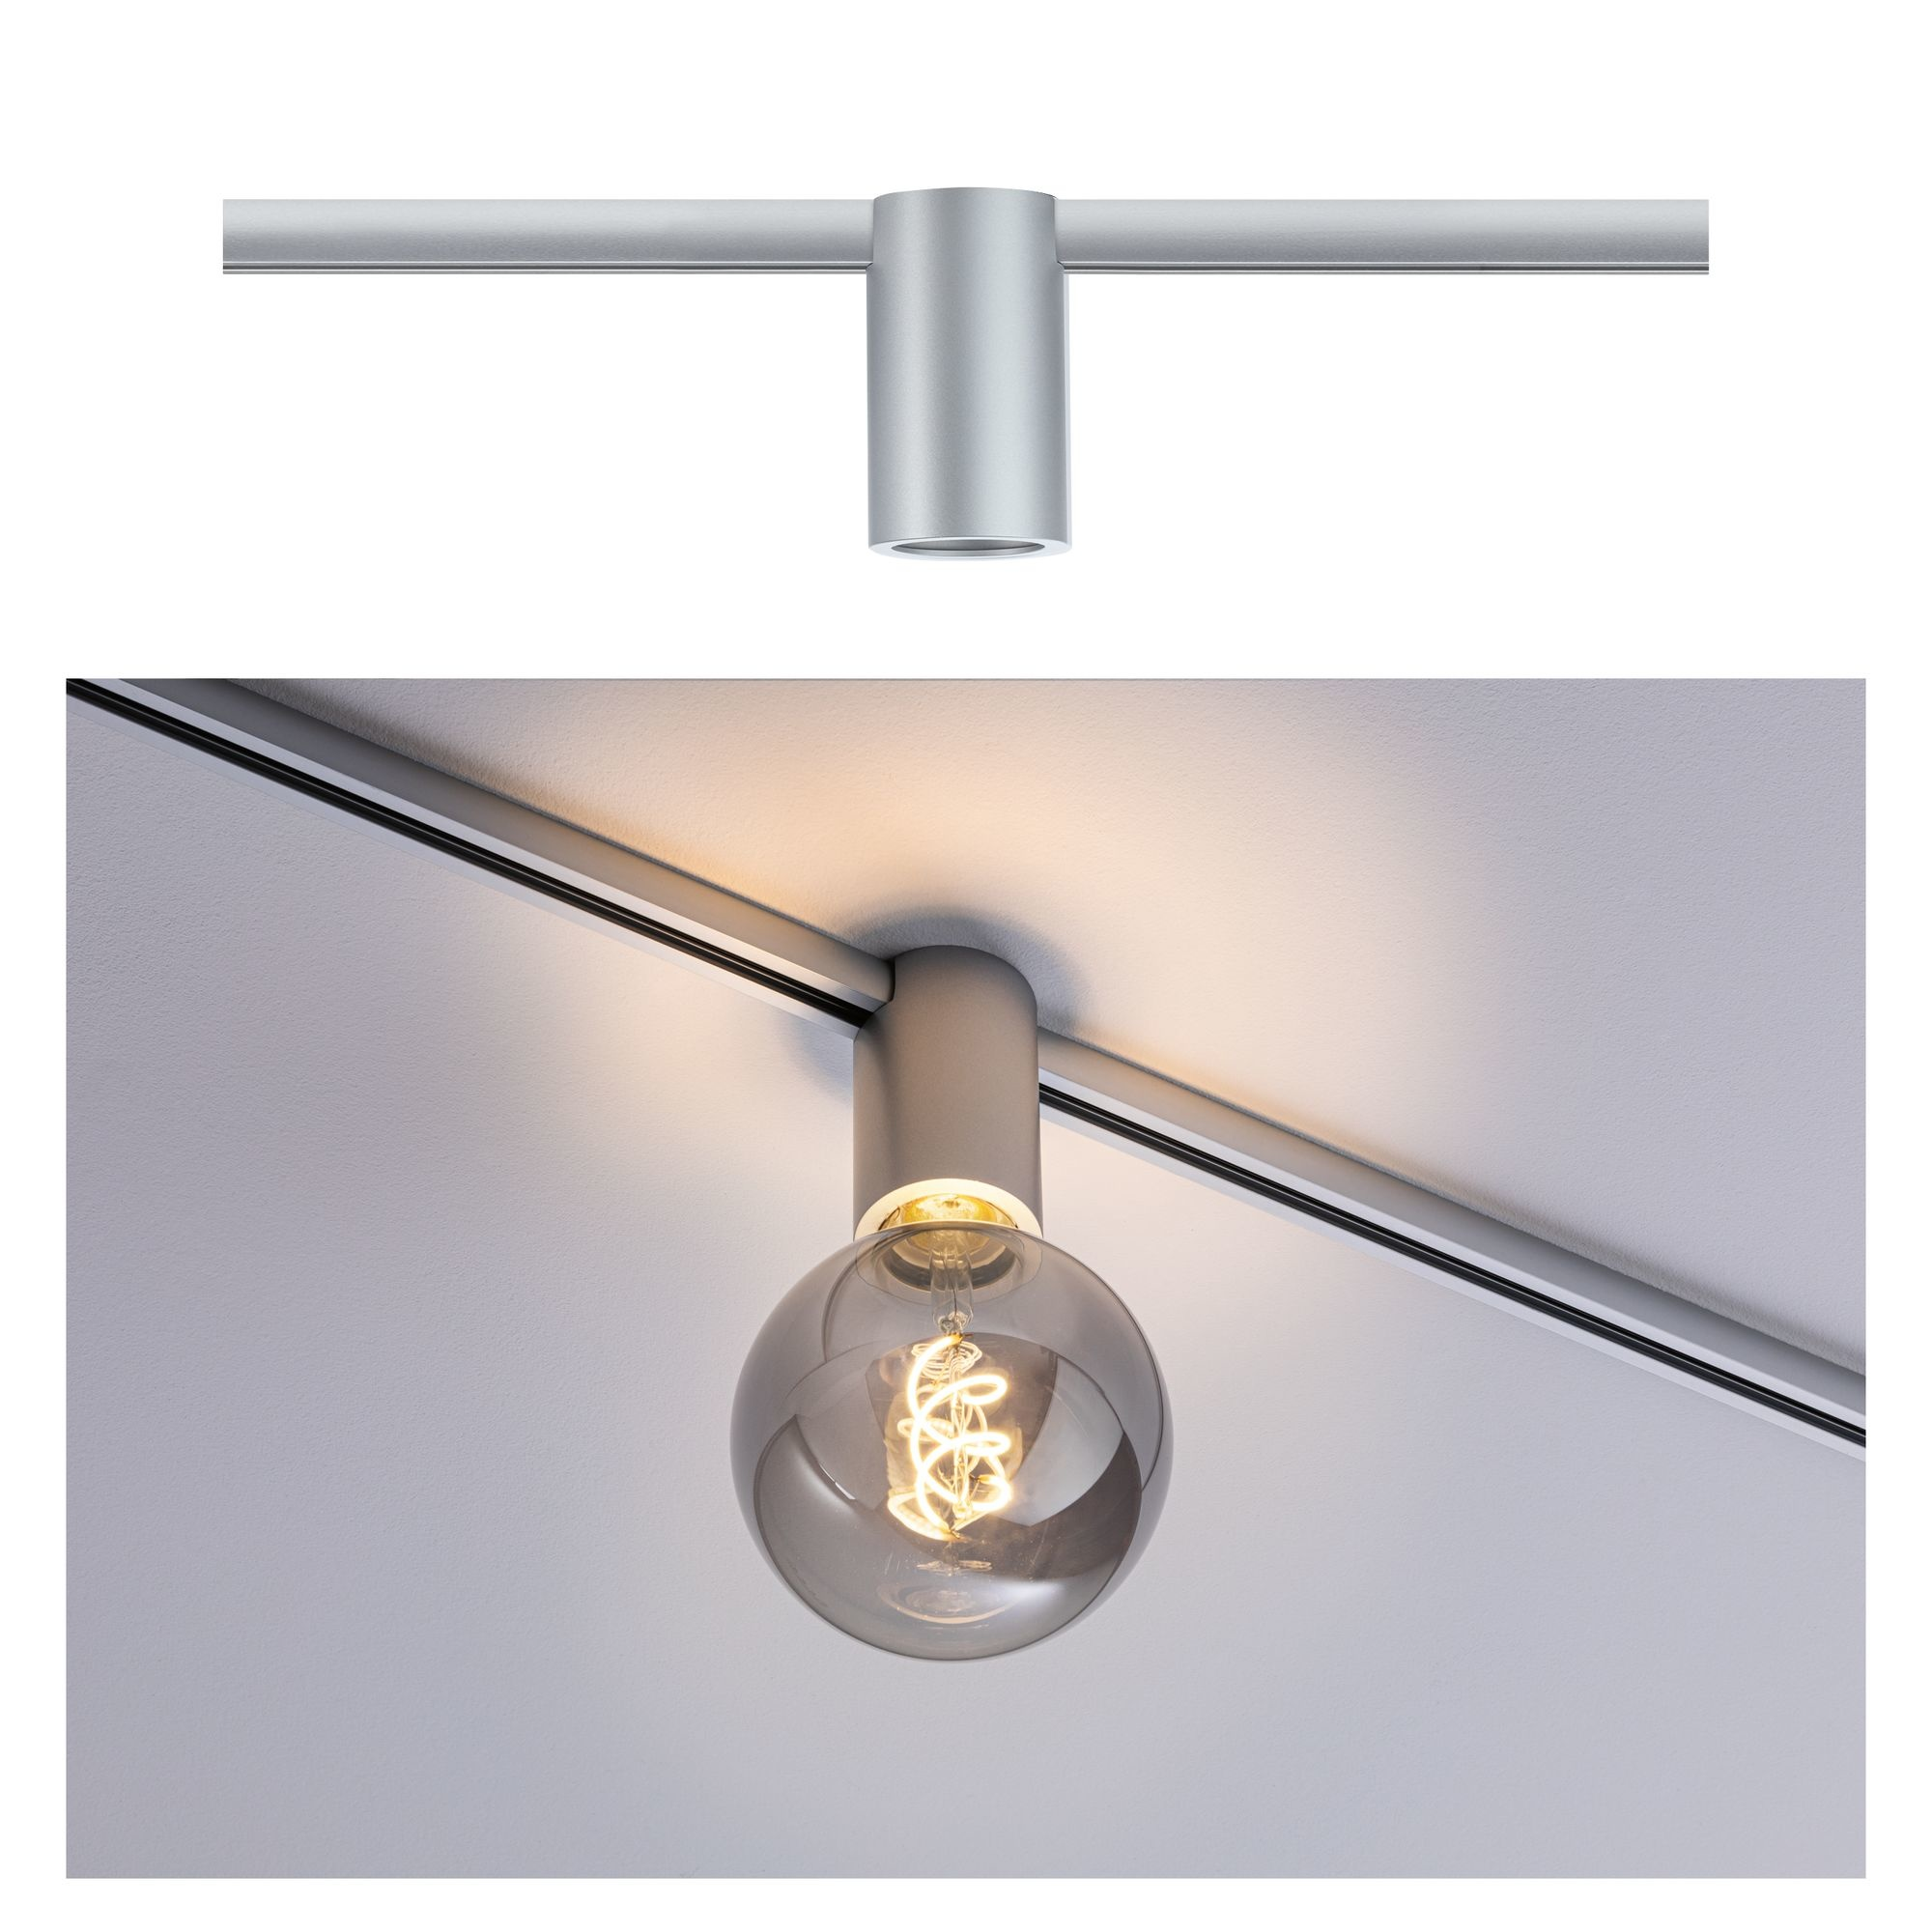 Paulmann URail Spot Ceiling Socket Chrom matt E27 dimmbar ohne Leuchtmittel